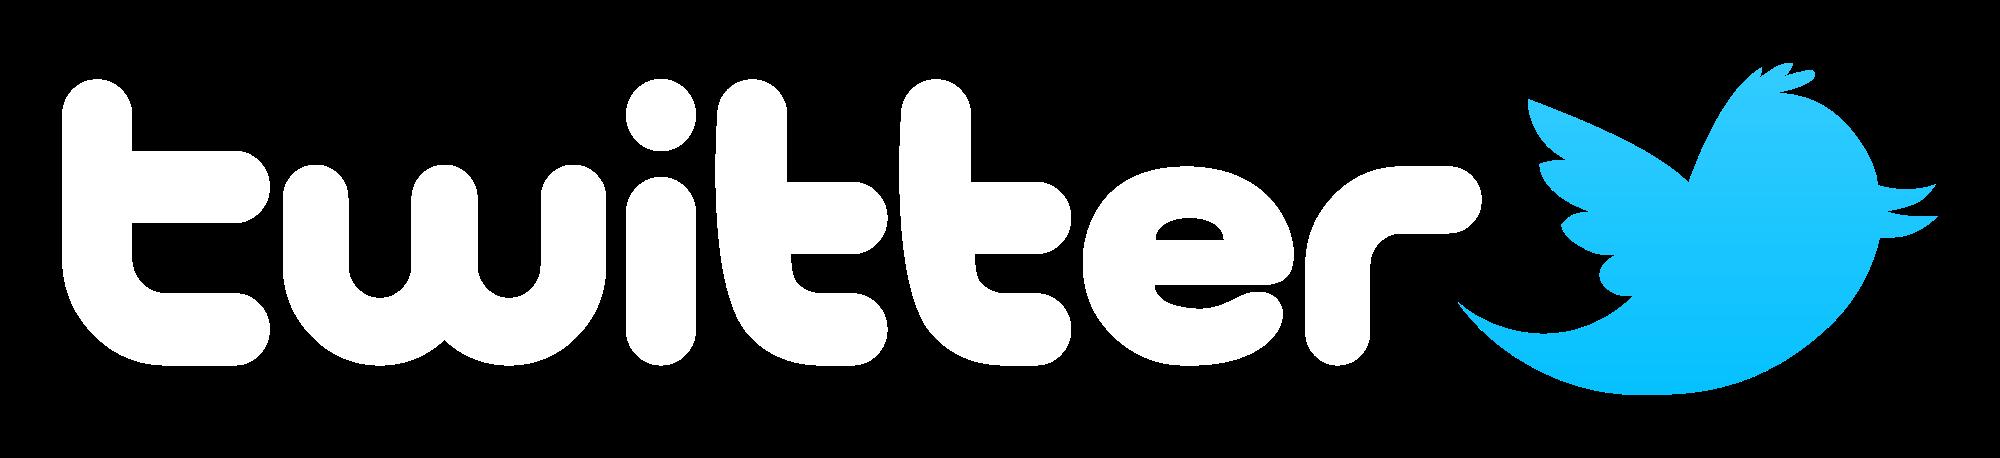 Twitter логотип PNG